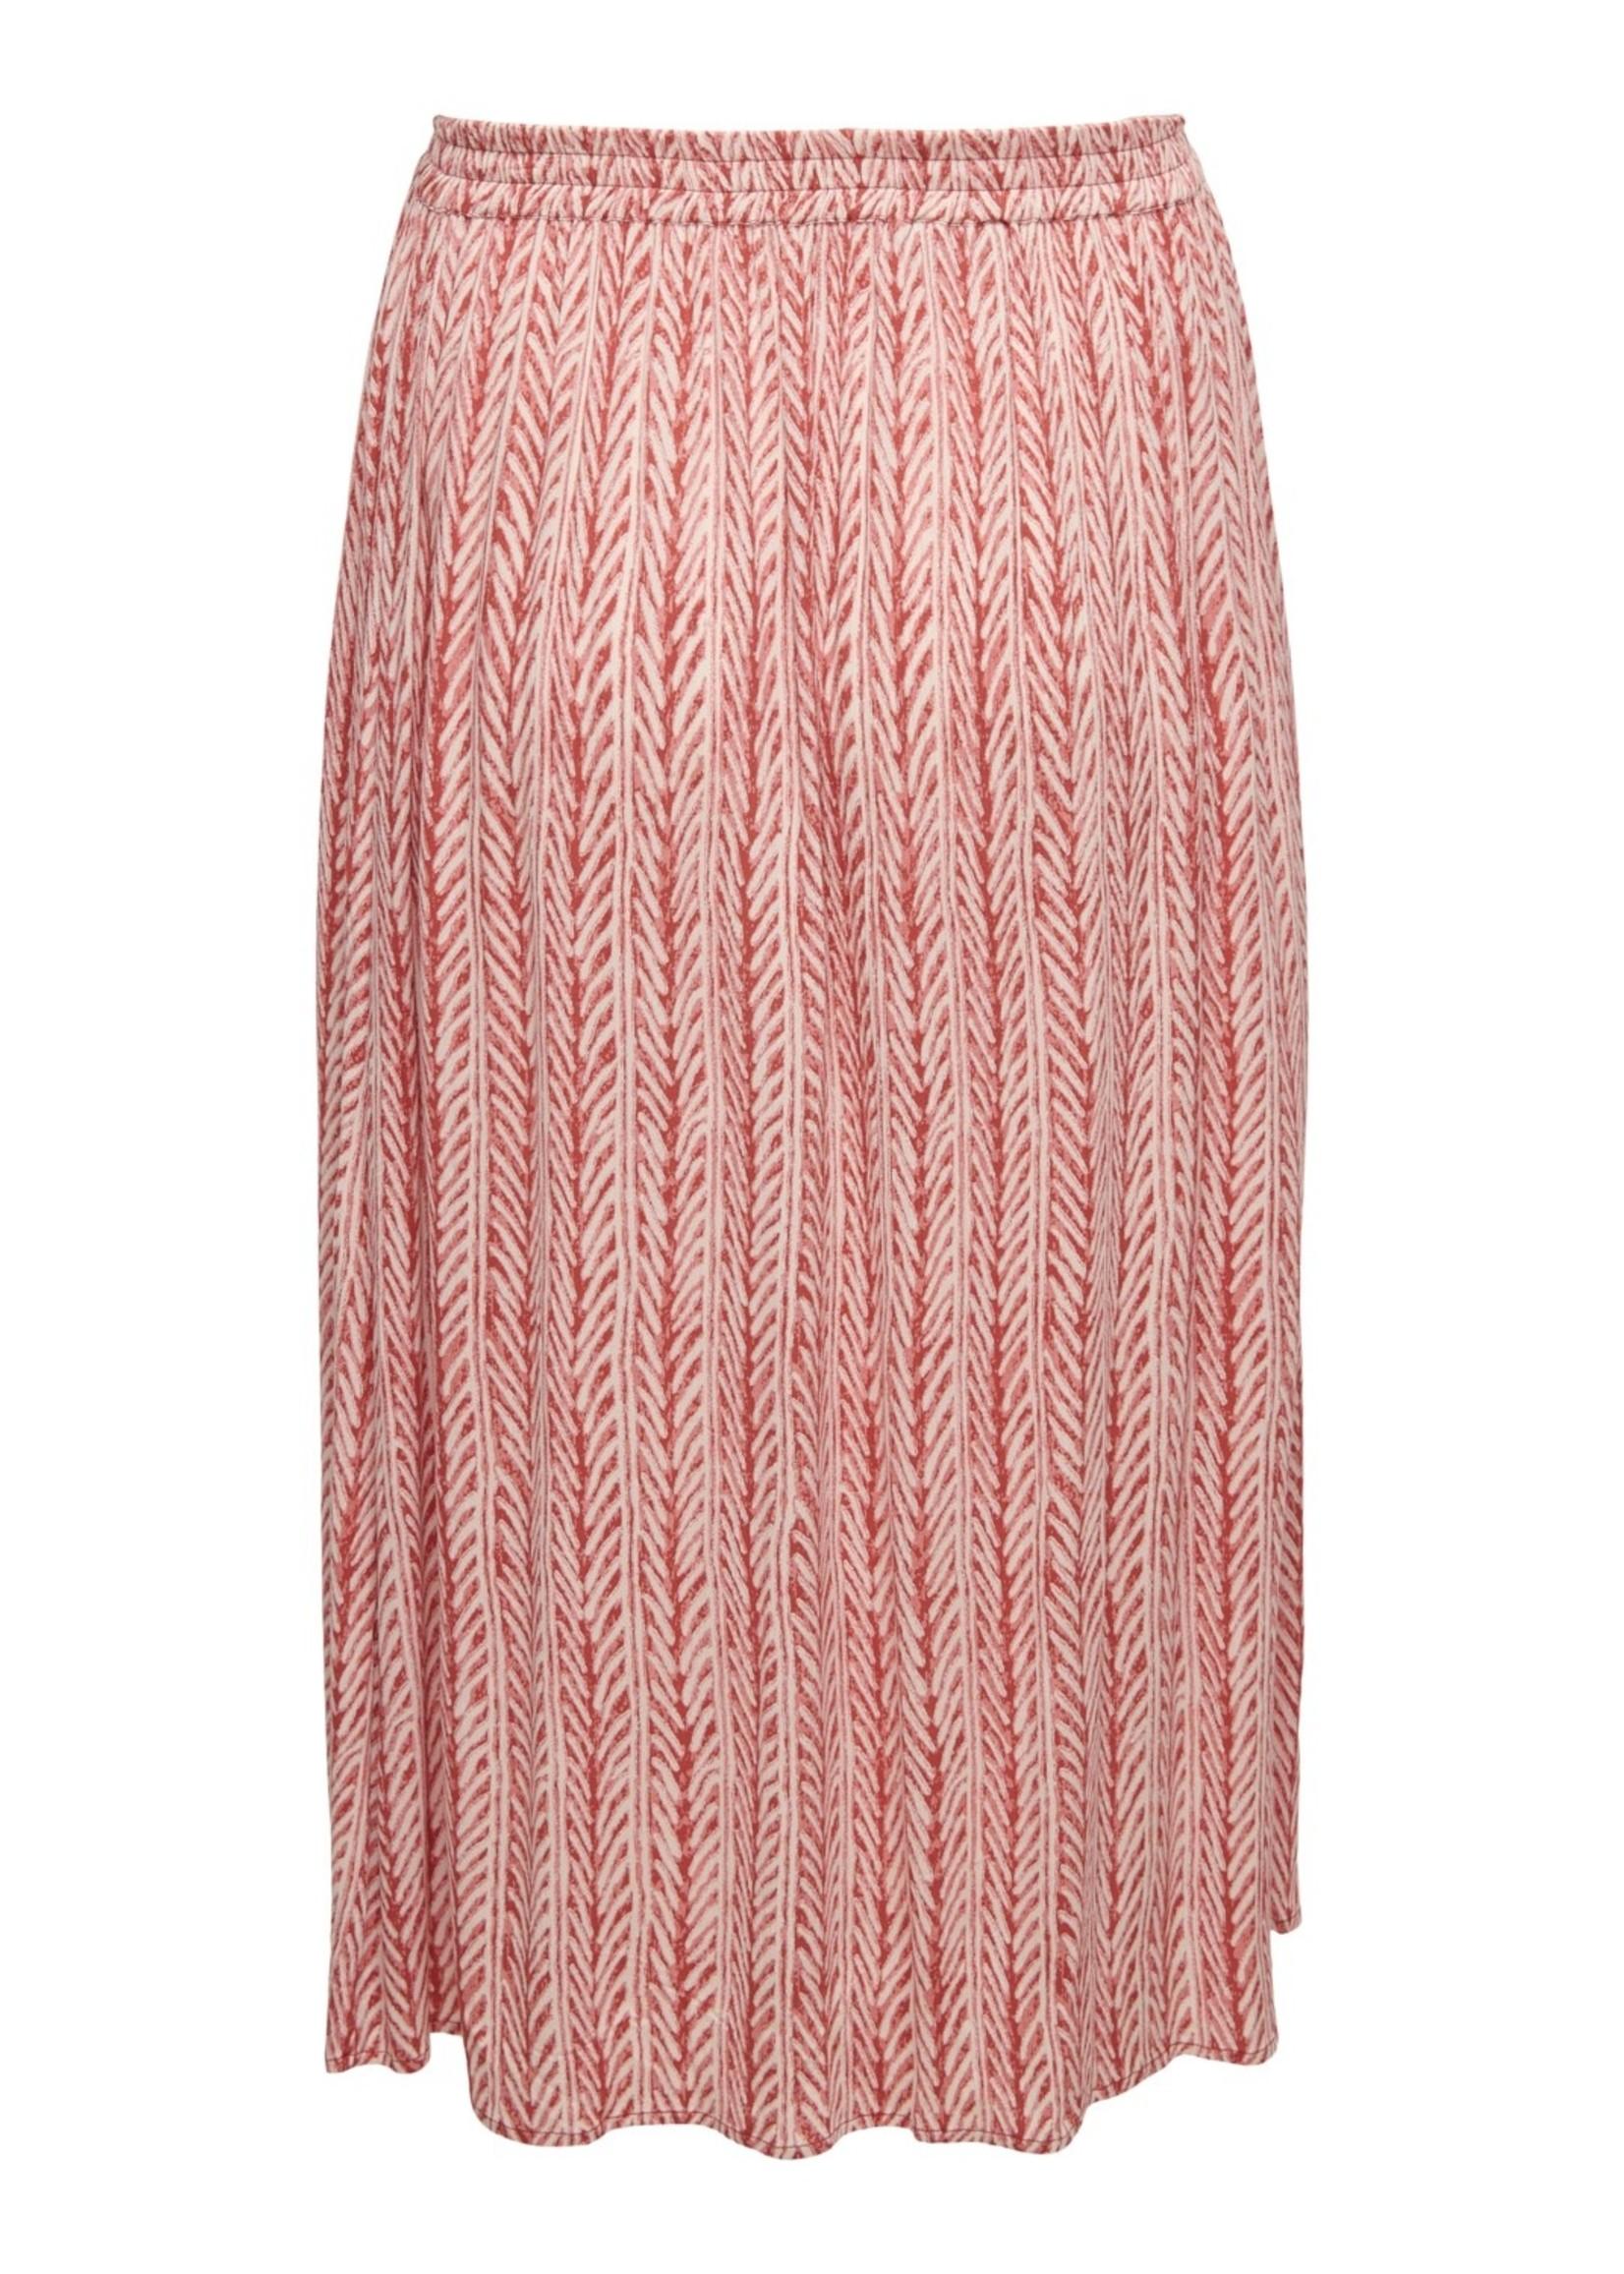 Only Carmakoma Only Carmakoma Trib Long Skirt